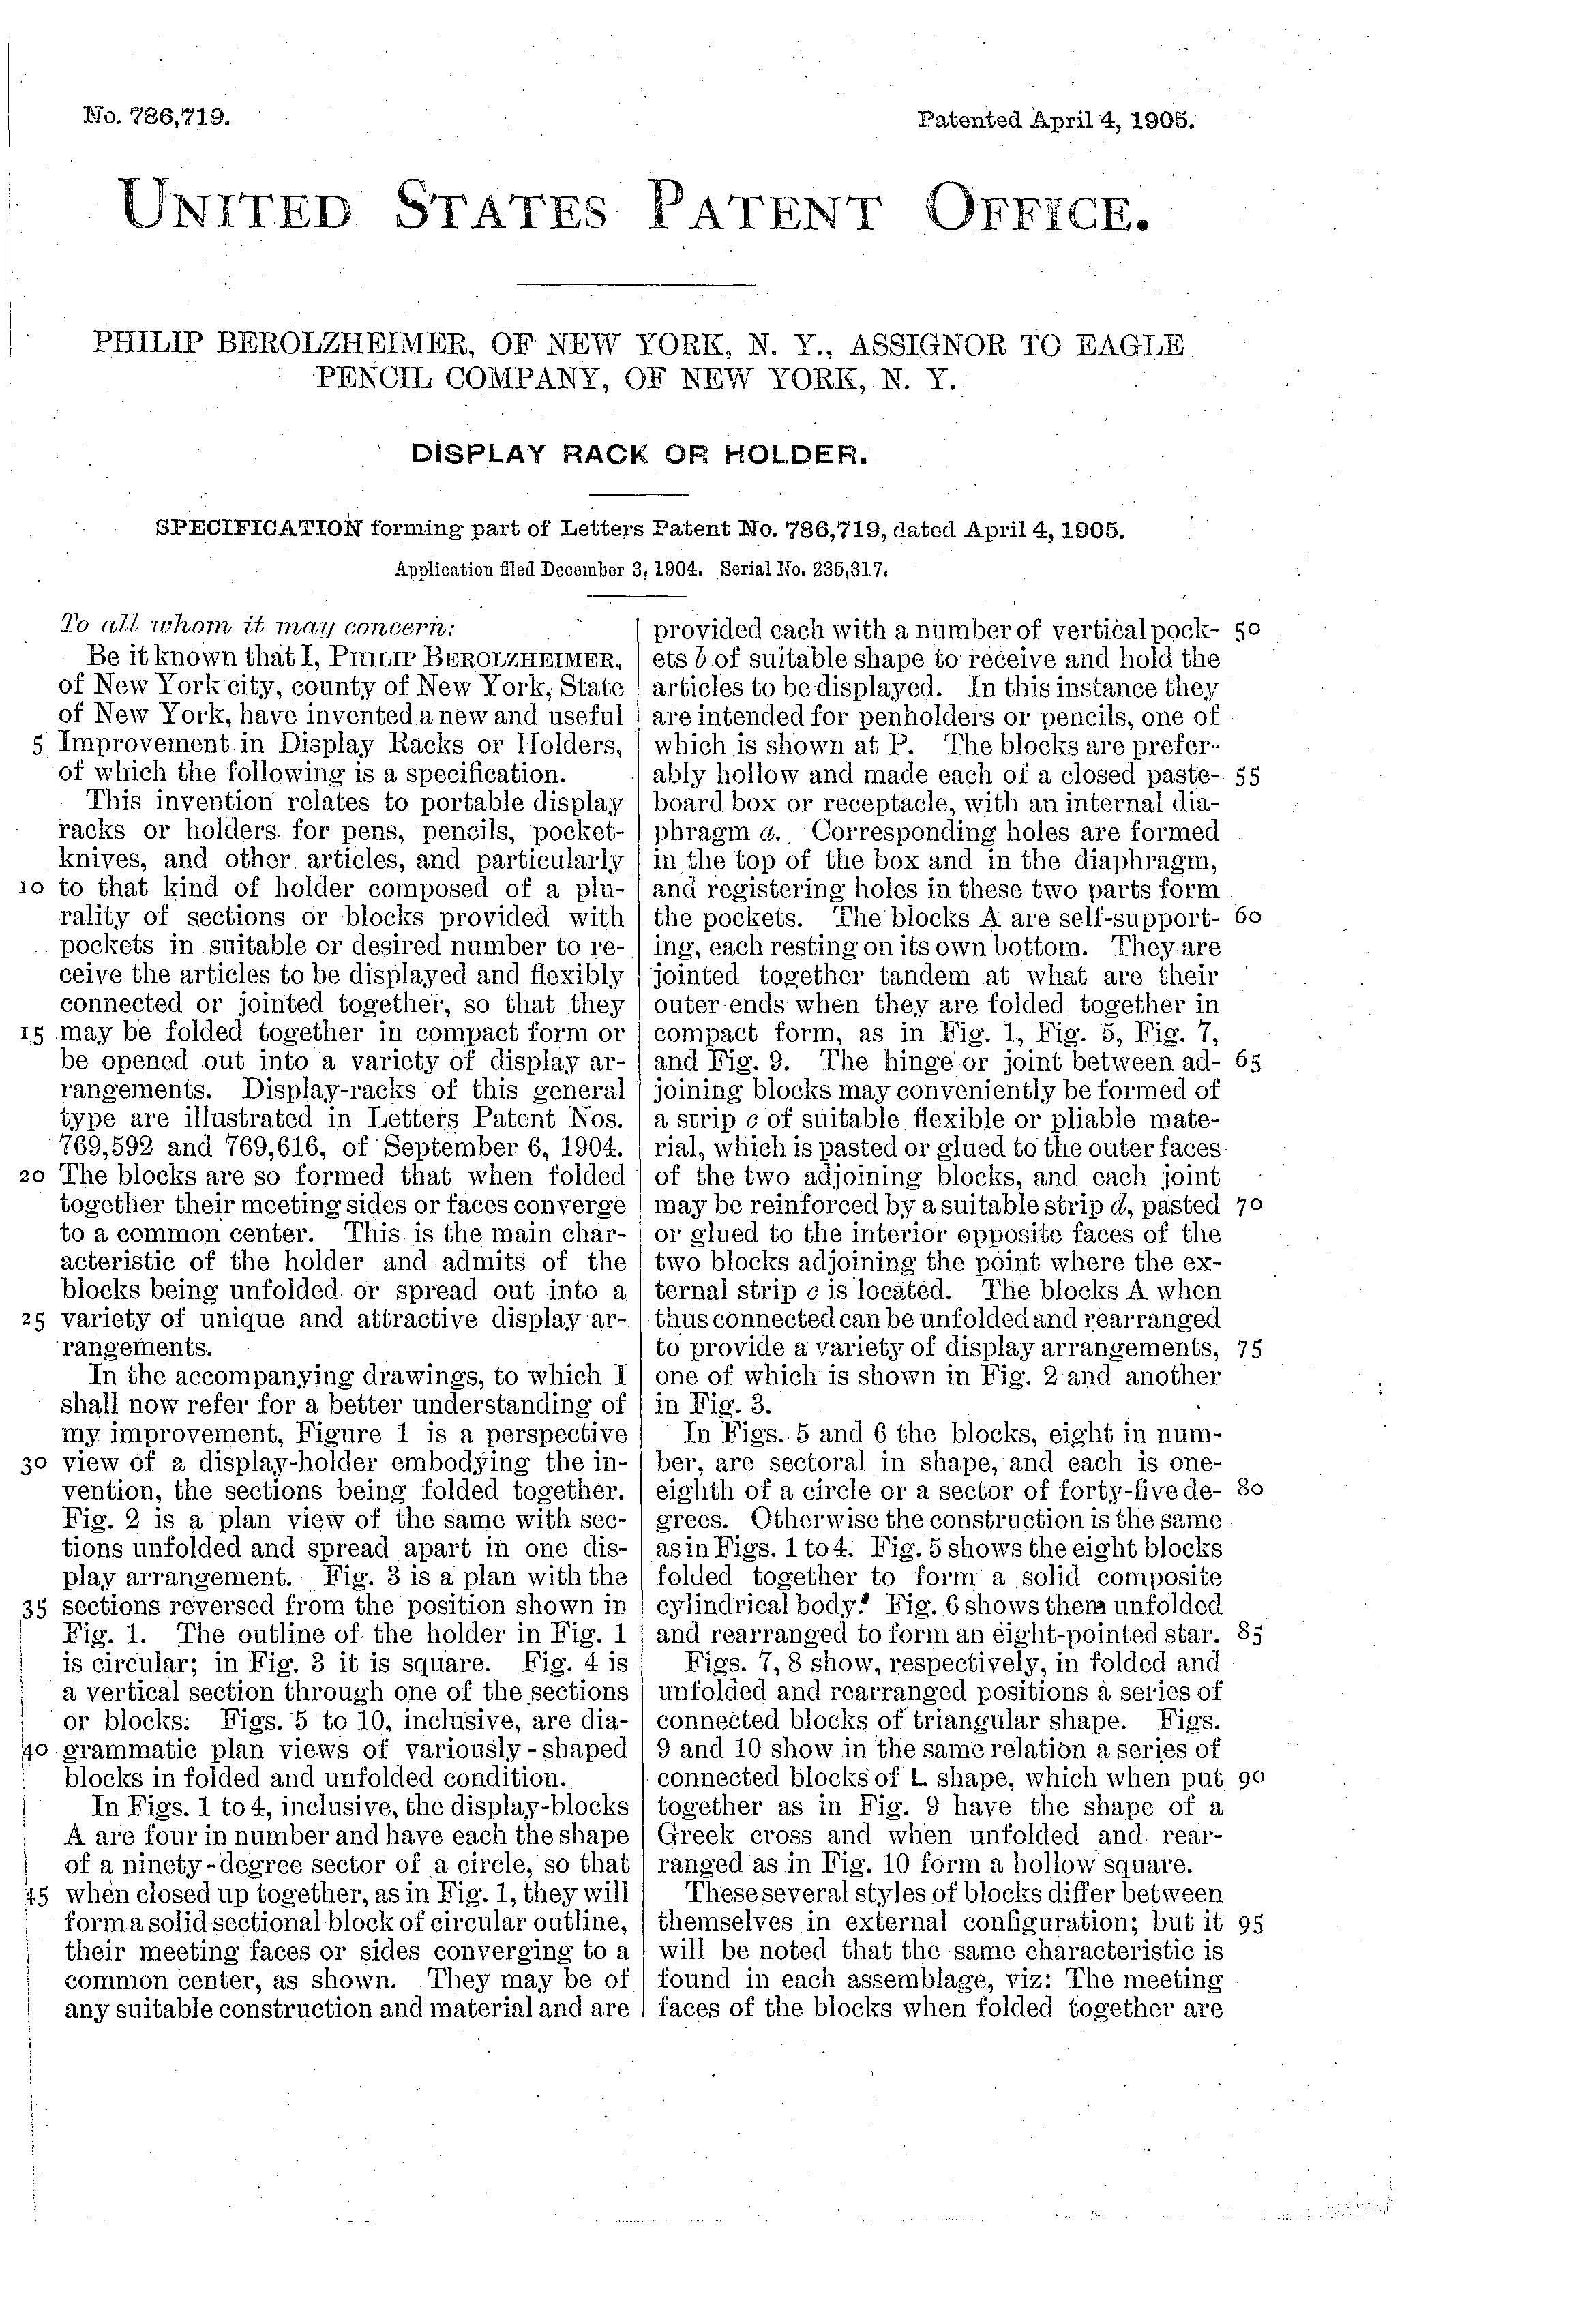 4 - PB 1905 Pencil Display Patent_Page_3.jpg